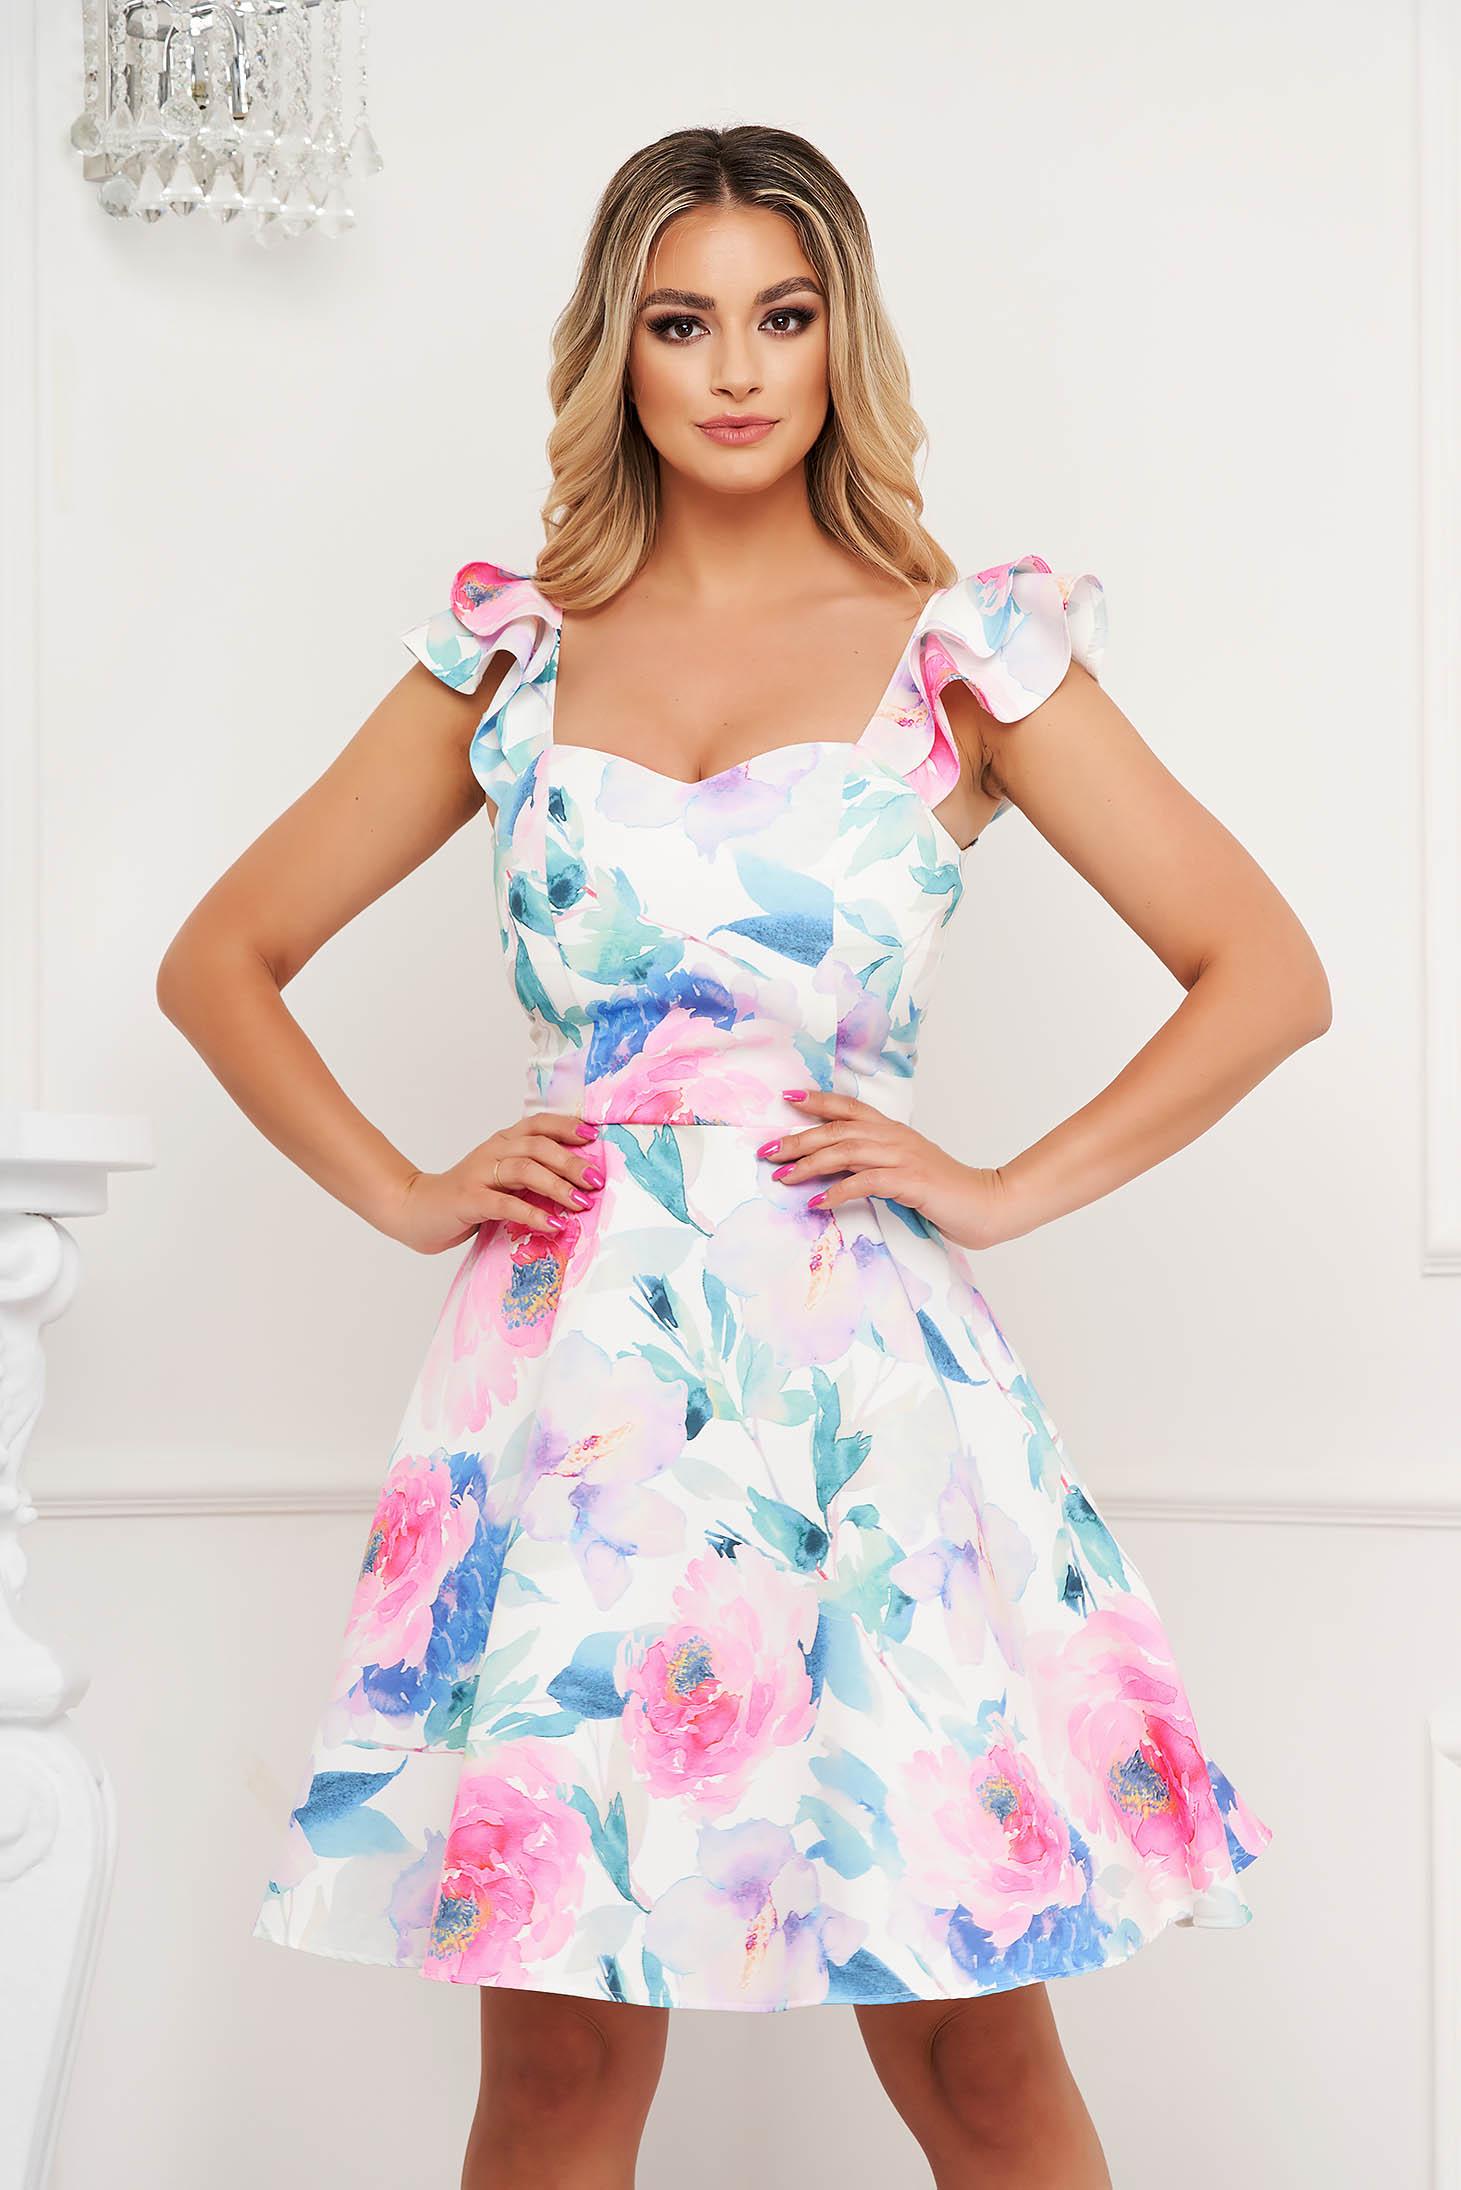 StarShinerS dress elegant short cut cloche cloth thin fabric with ruffle details